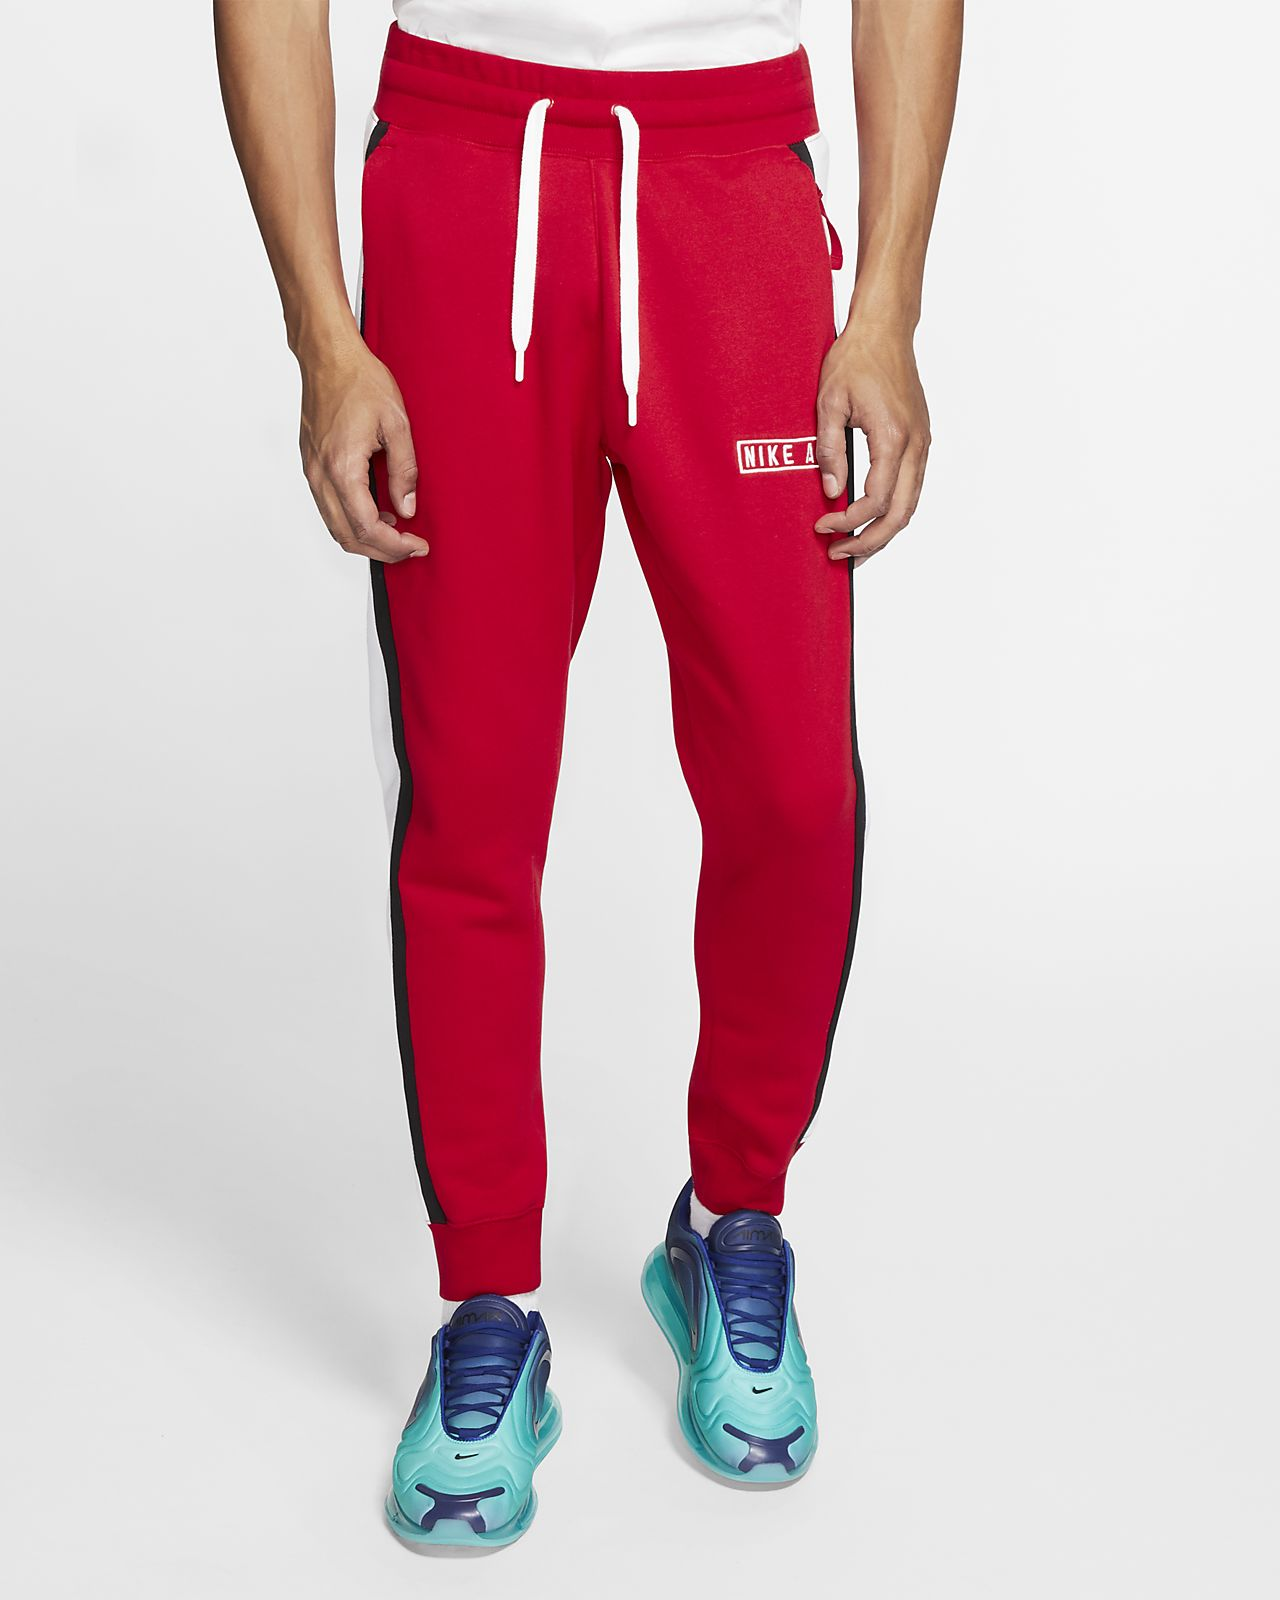 60b72bf222 Nike Air Men's Fleece Trousers